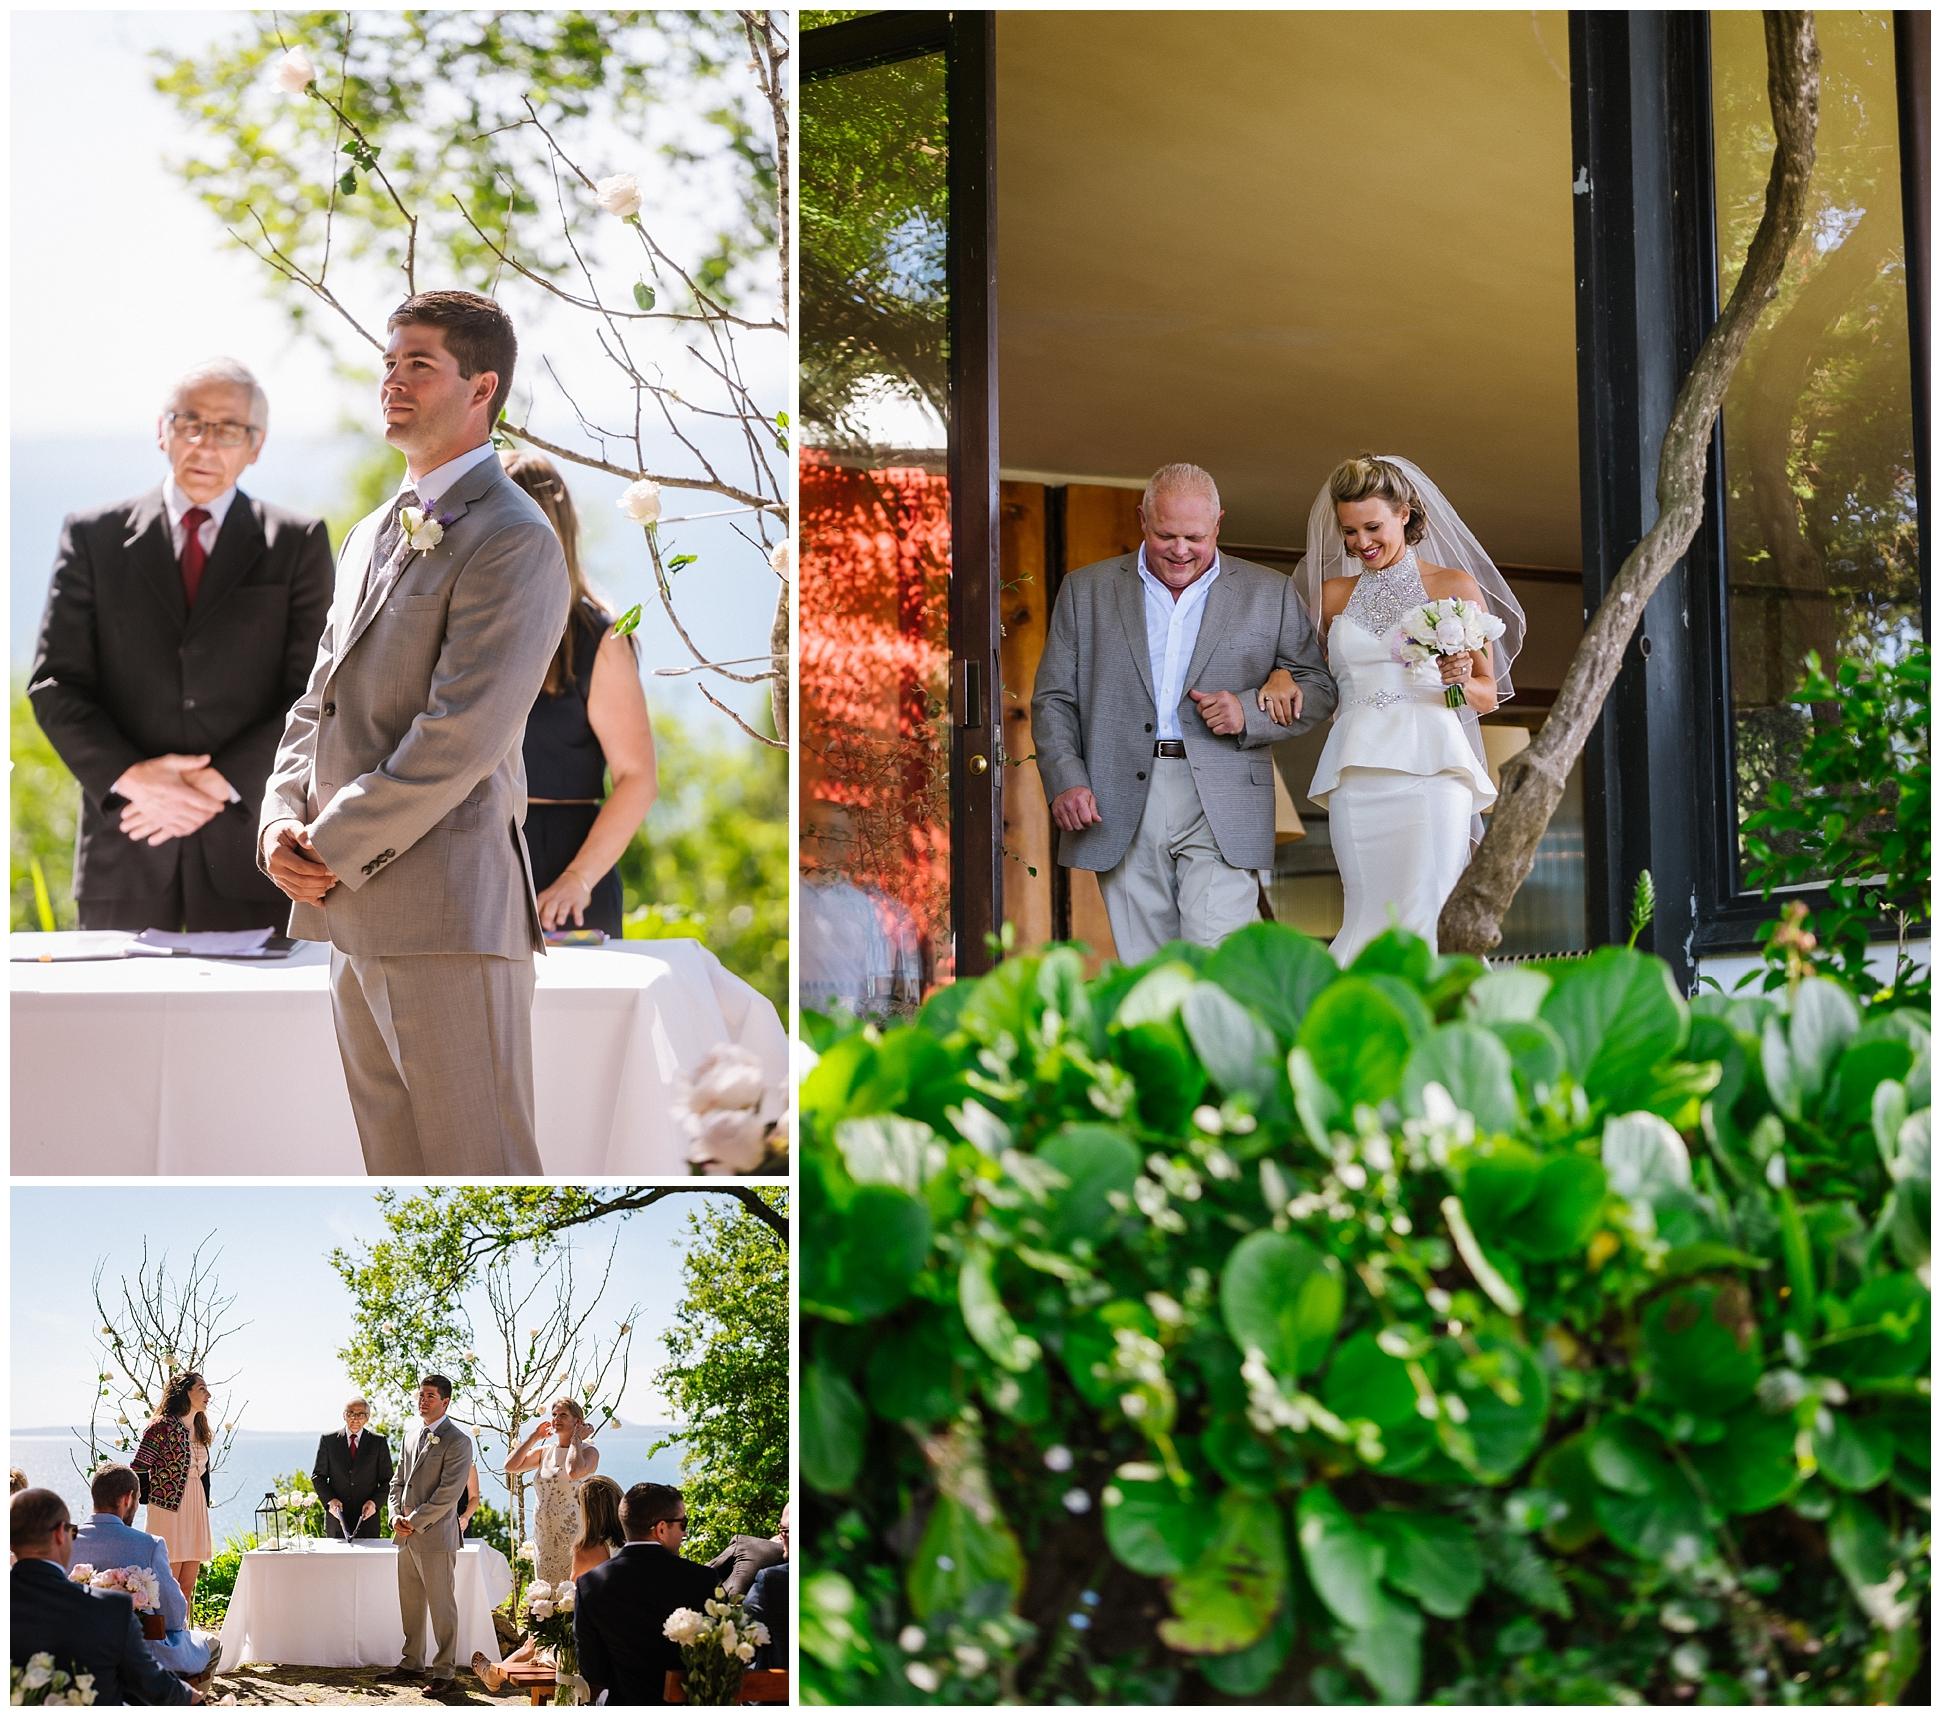 Cheilean-destination-adventure-wedding-florida-patagonia-pucon-santa-cruz-vsco_0092.jpg